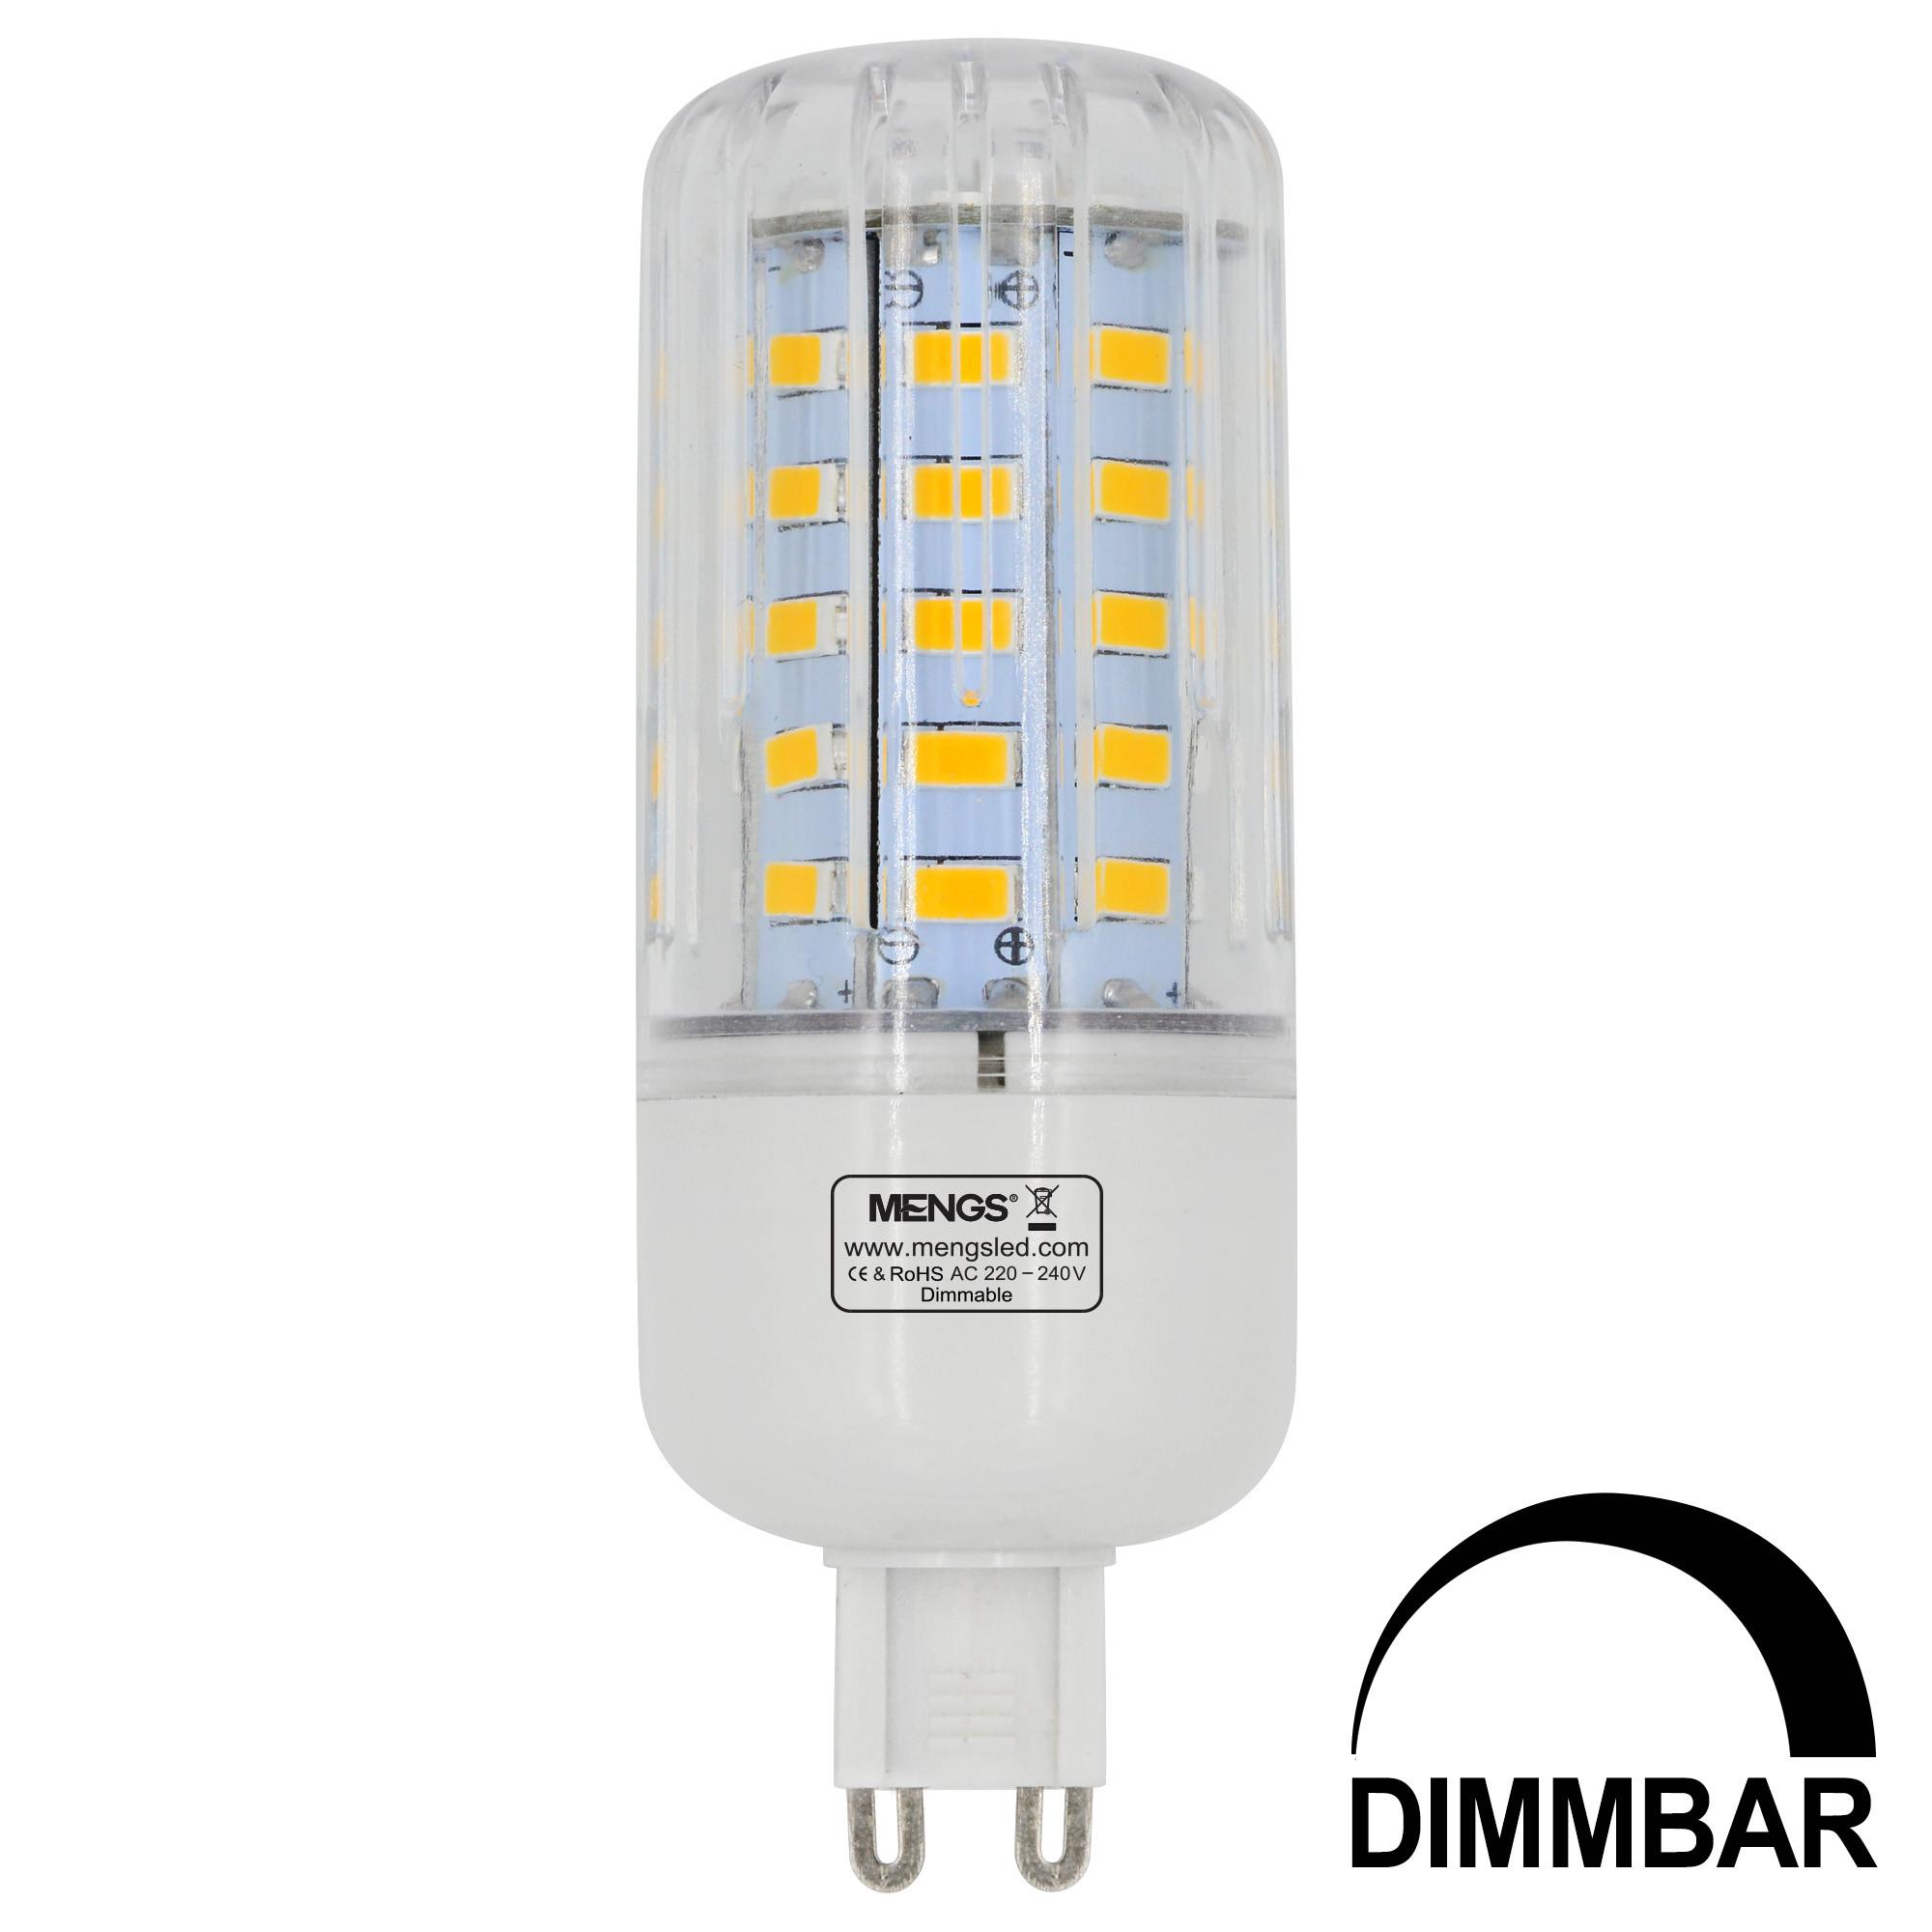 g9 7w led dimmable corn light 50x 5736 smd led bulb lamp. Black Bedroom Furniture Sets. Home Design Ideas